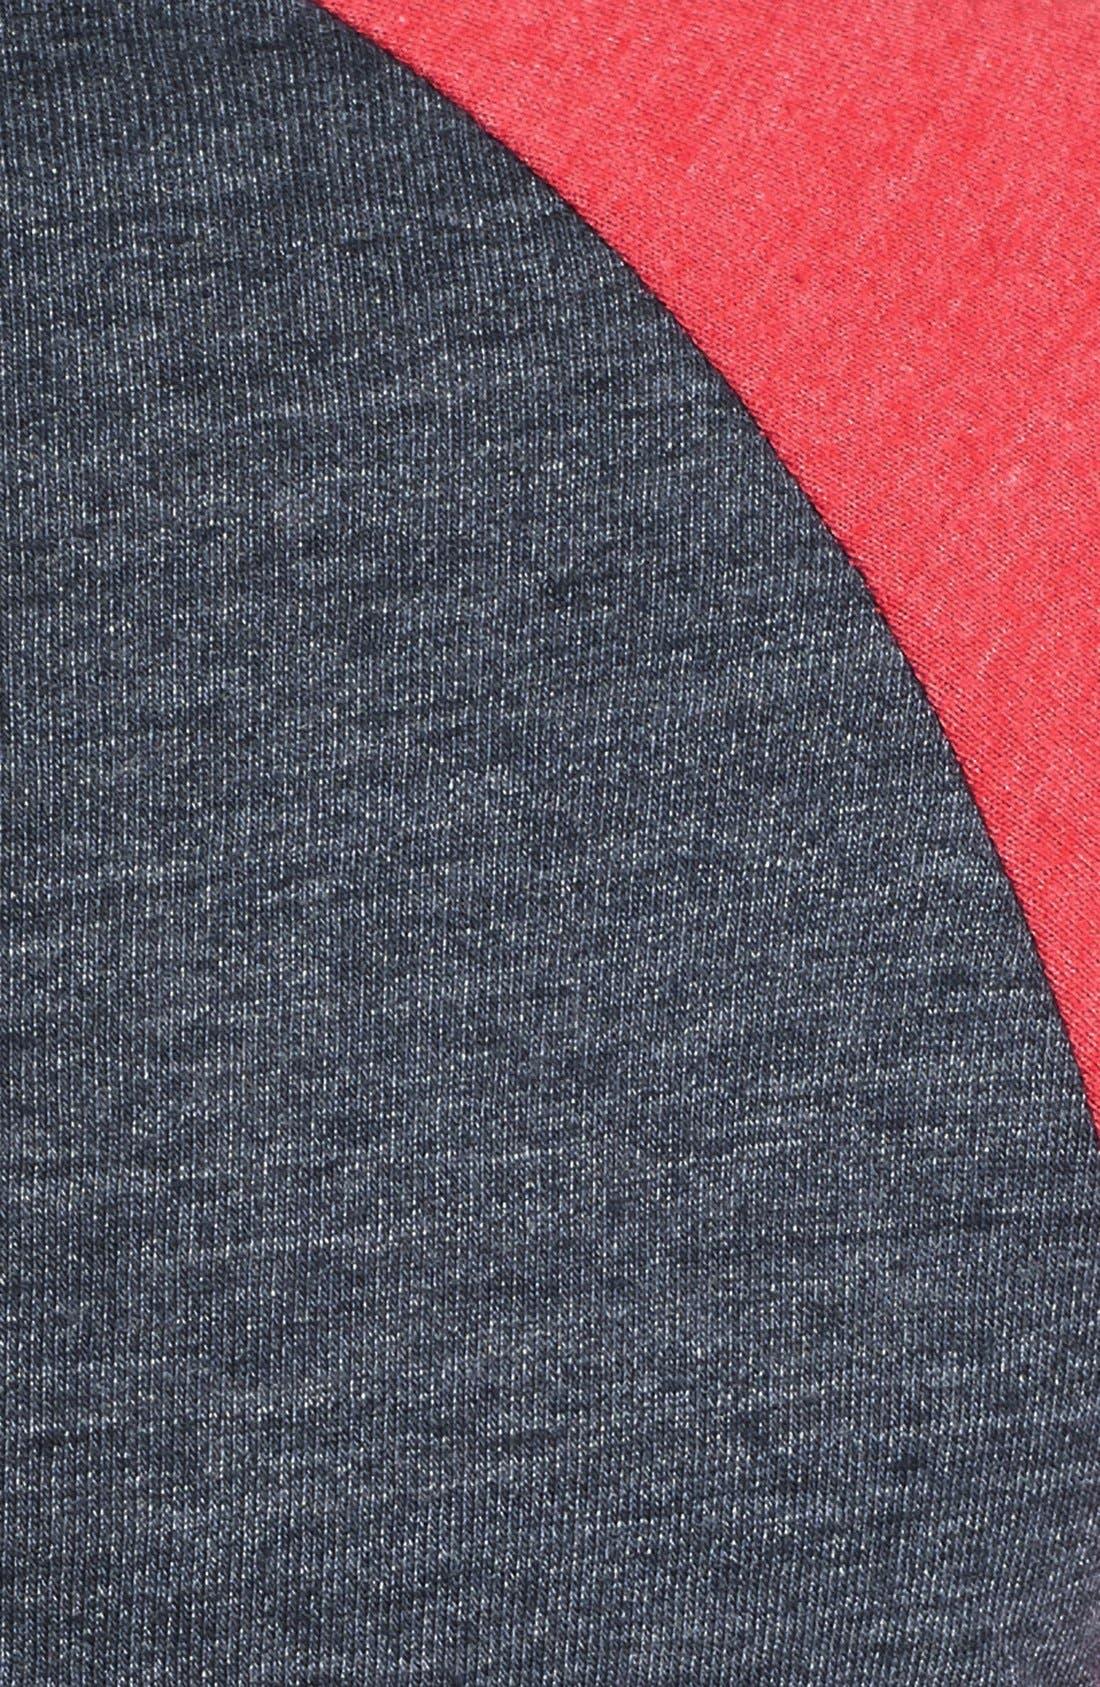 Alternate Image 3  - Alternative Raglan Baseball T-Shirt